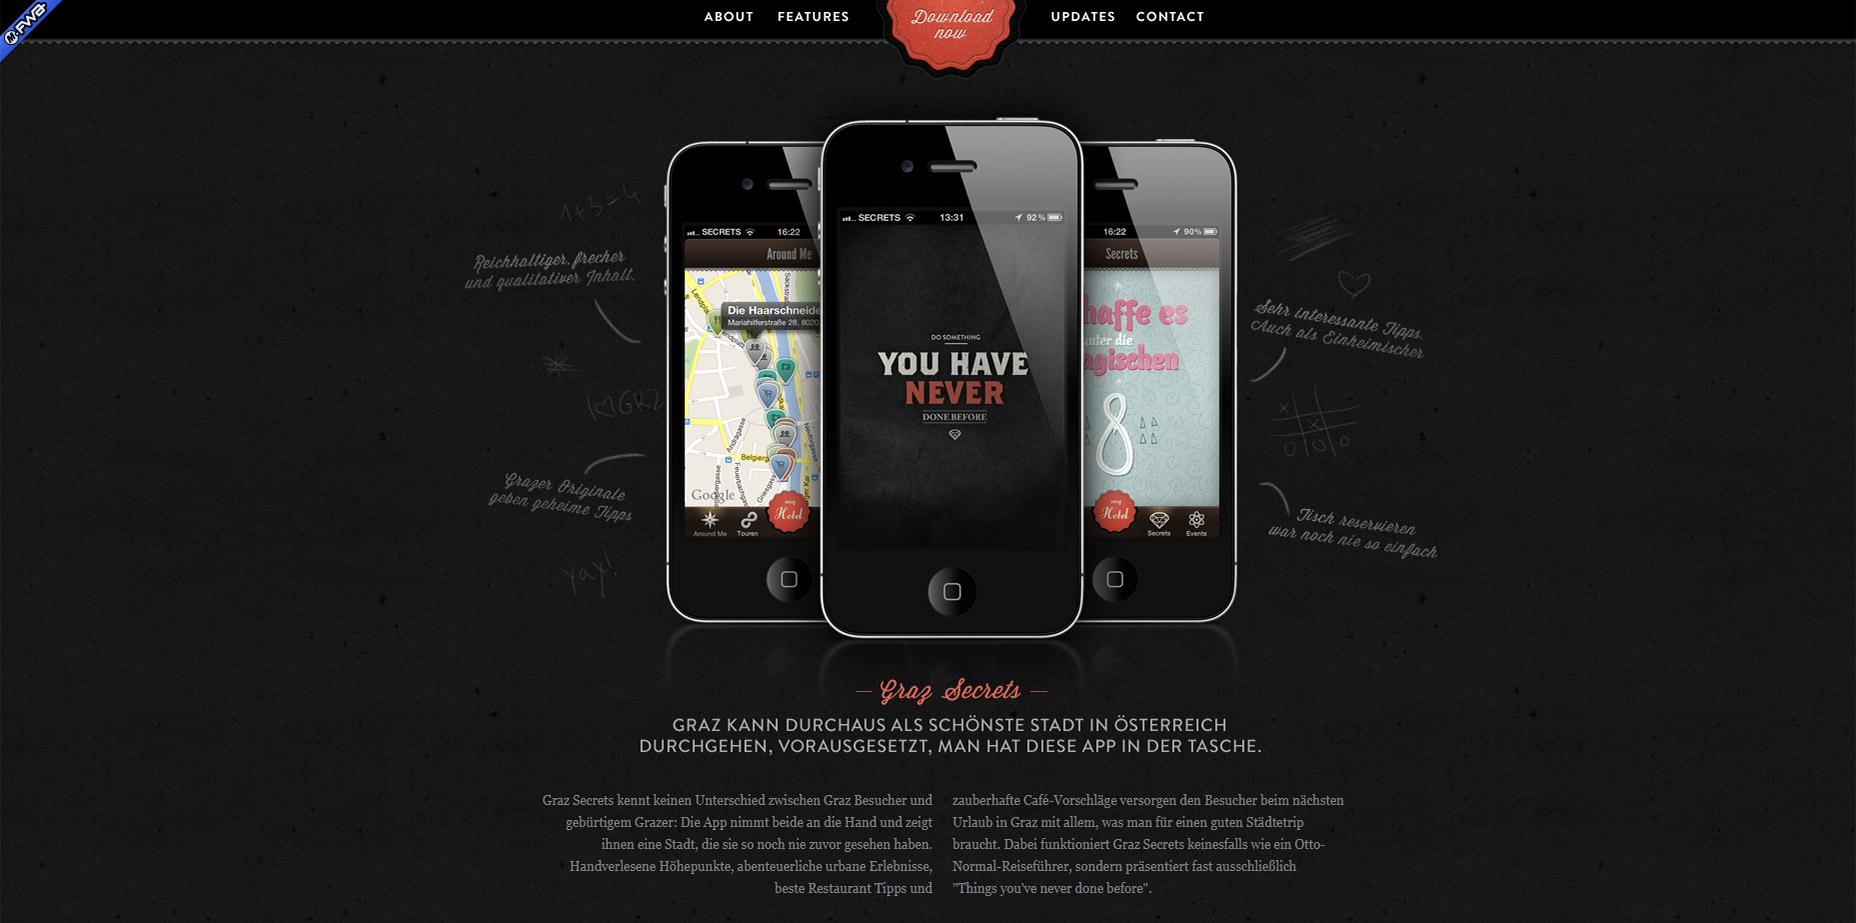 04-graz-secrets-iphone-app